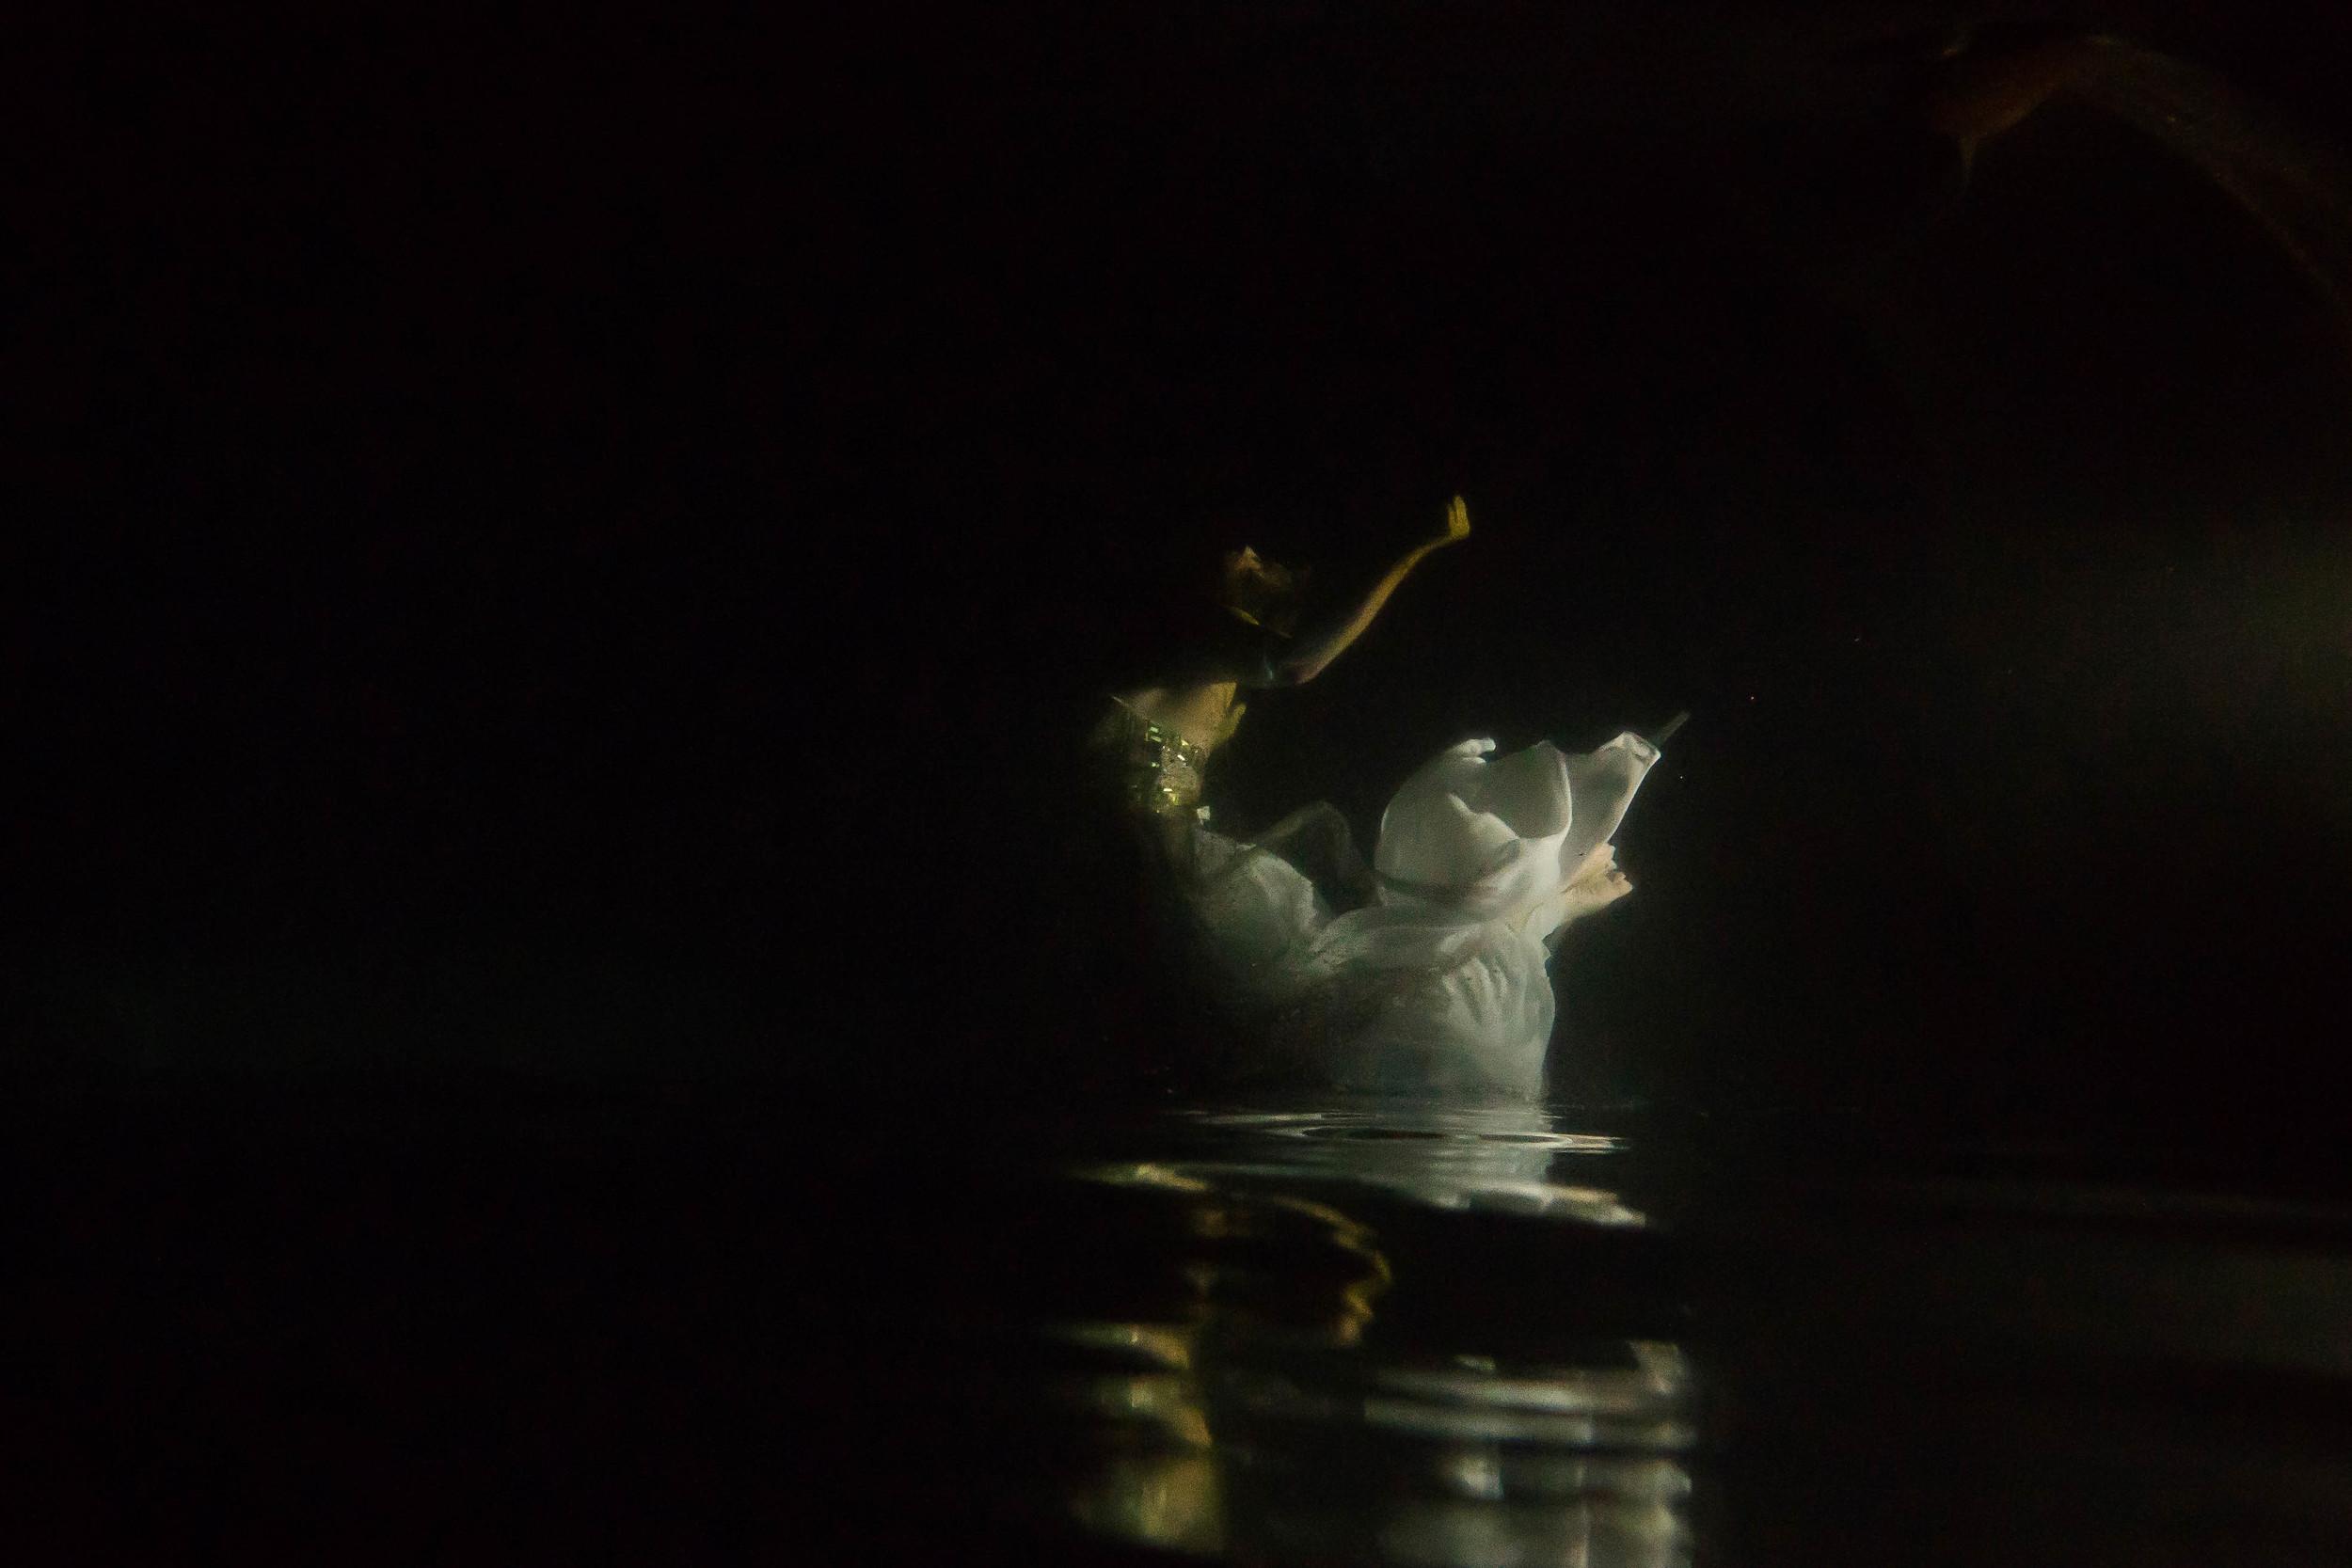 WaterLily1_LaurenDavis_MERMAID_BrienneMichelle_05.JPG